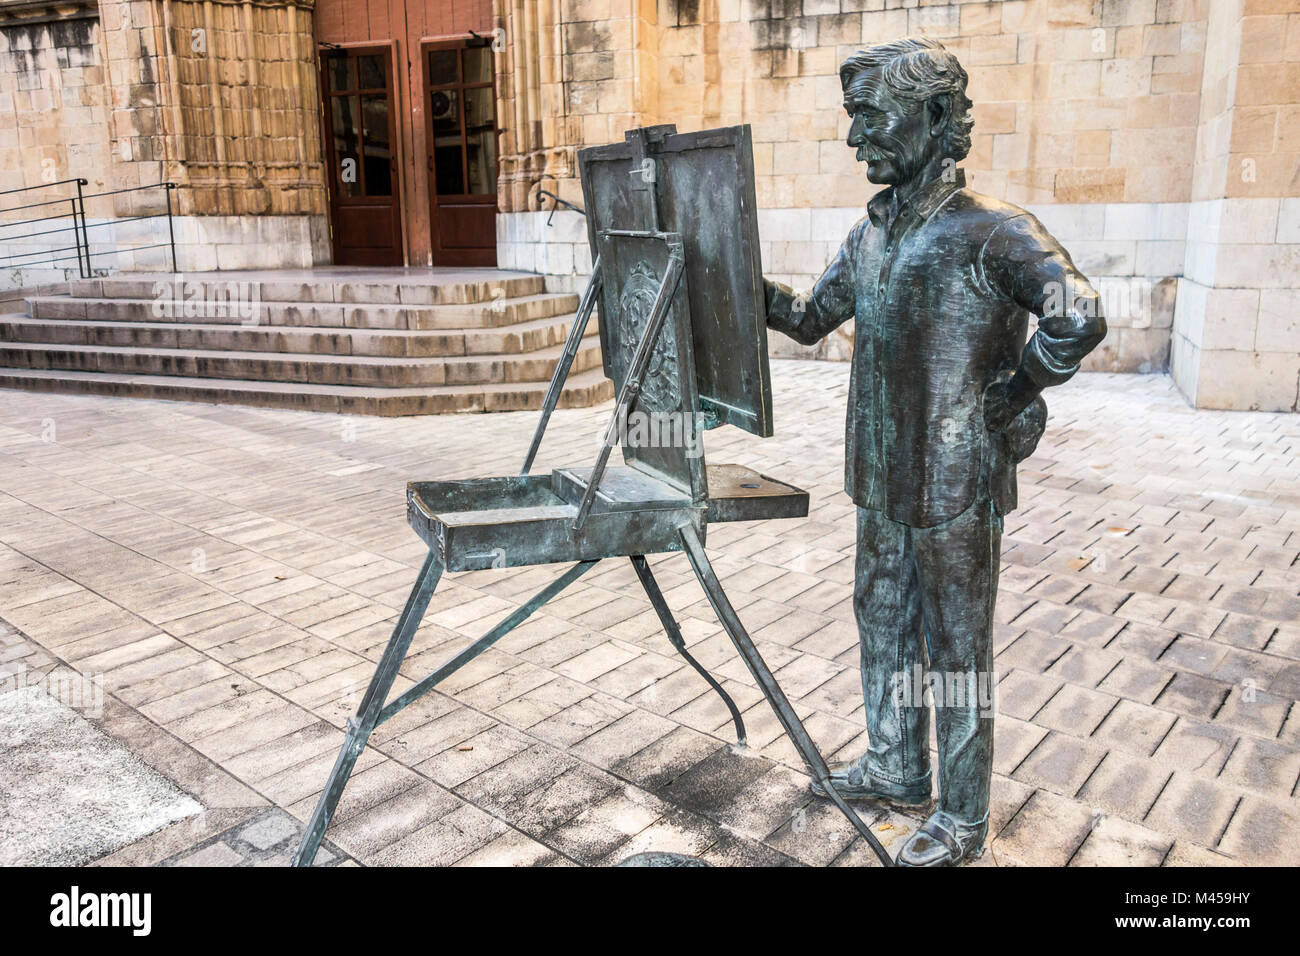 Sculpture Statue Tribute To Artist Juan Jose Salas By Carlos Vento Stock Photo Alamy